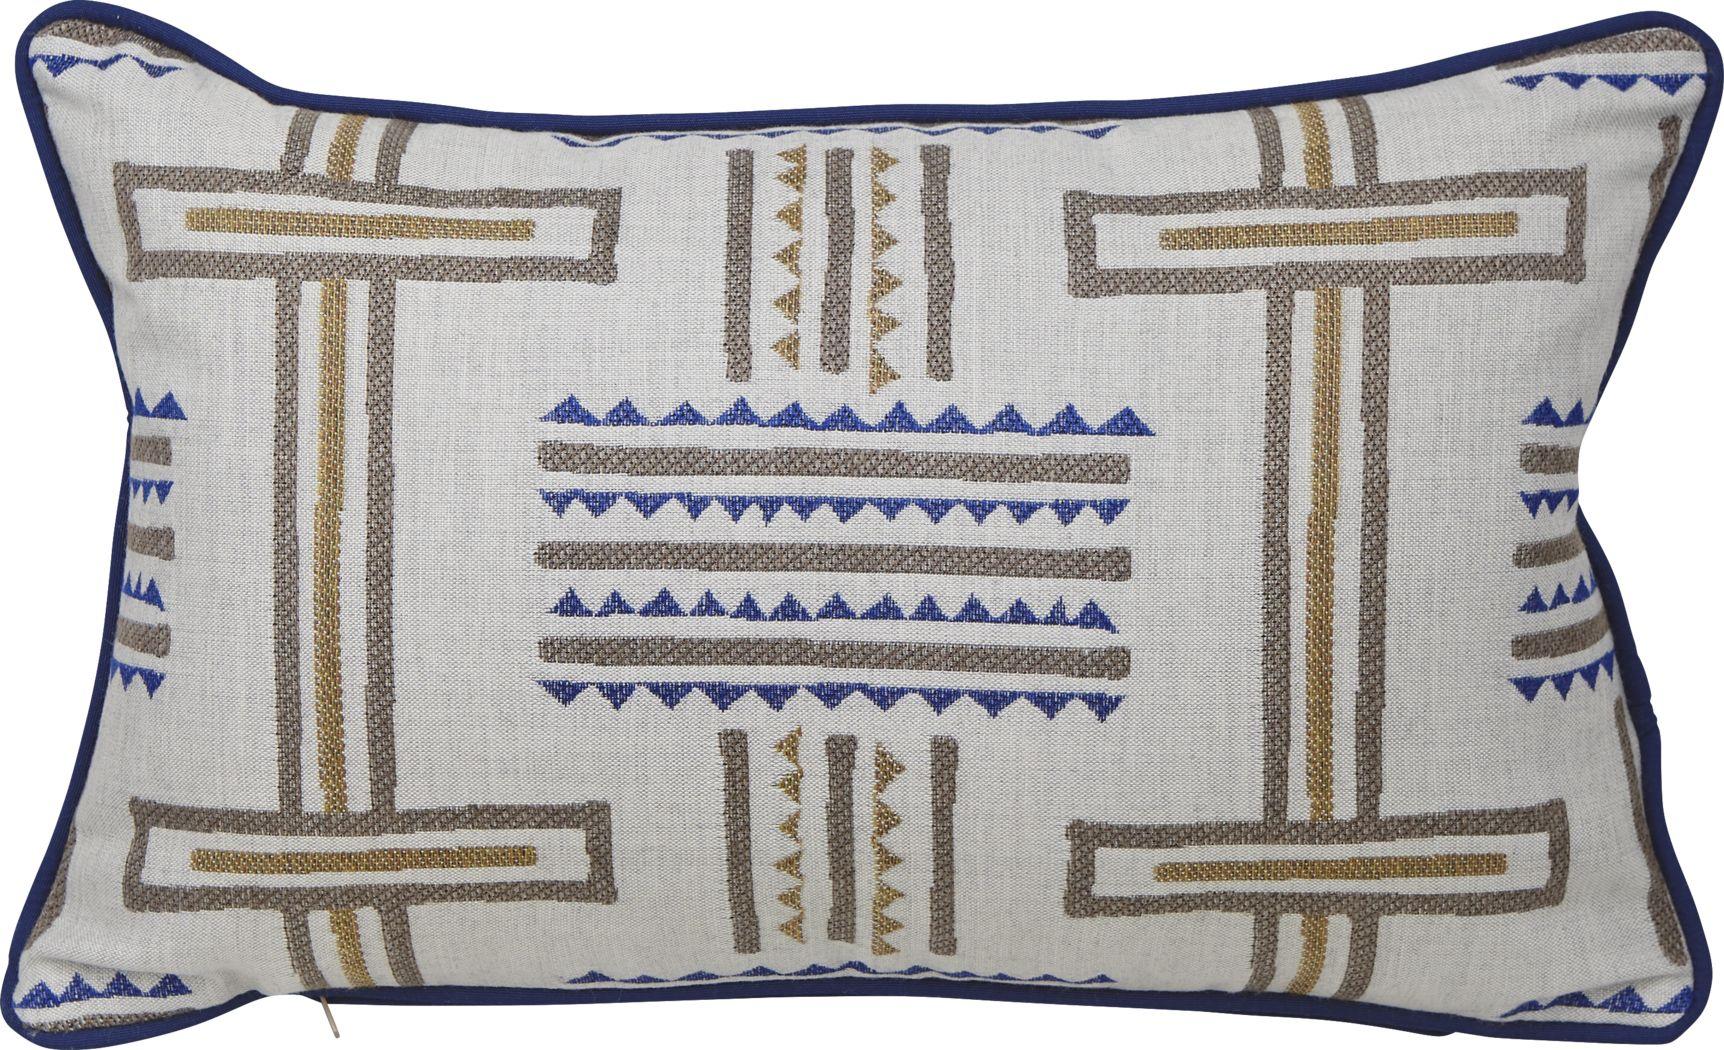 Tolson Twilight Blue Indoor/Outdoor Accent Pillow